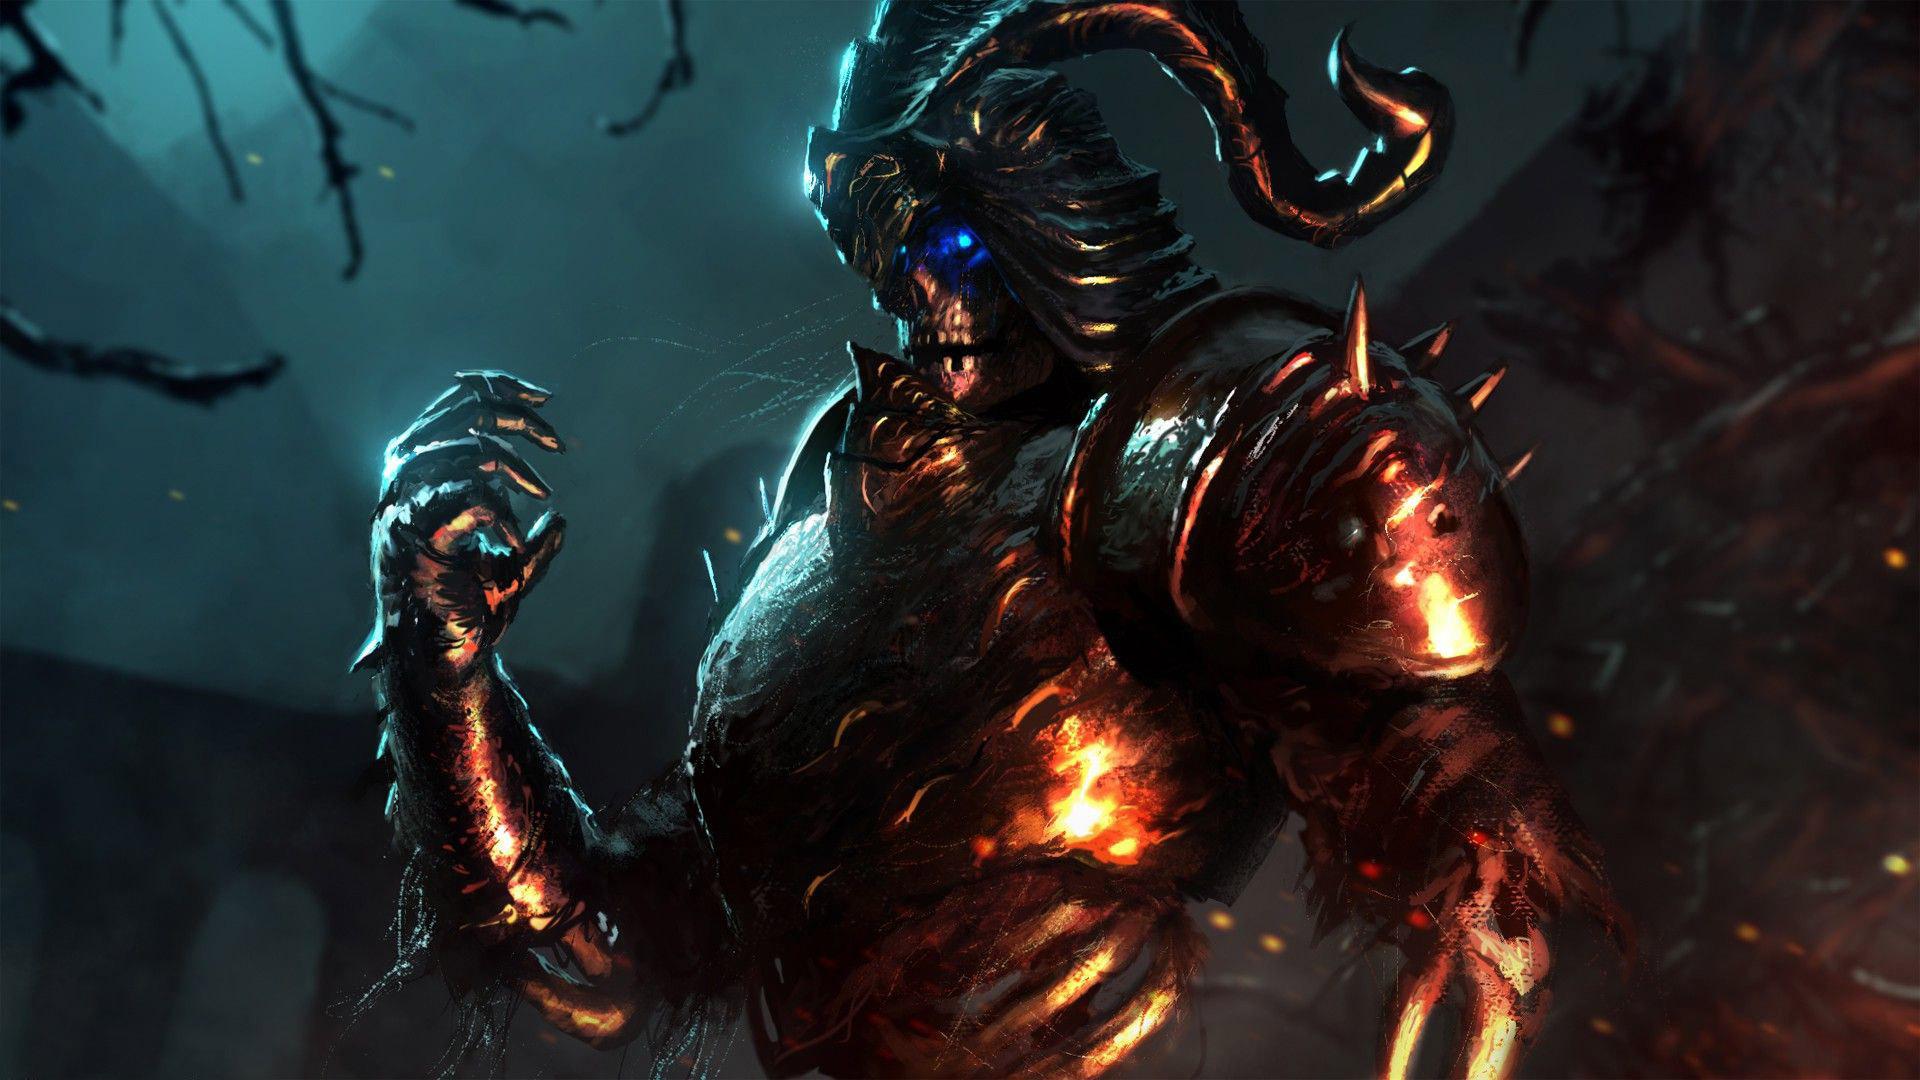 Dark Souls 2 Wallpapers Hd Download: Dark Souls II Full HD Wallpaper And Background Image